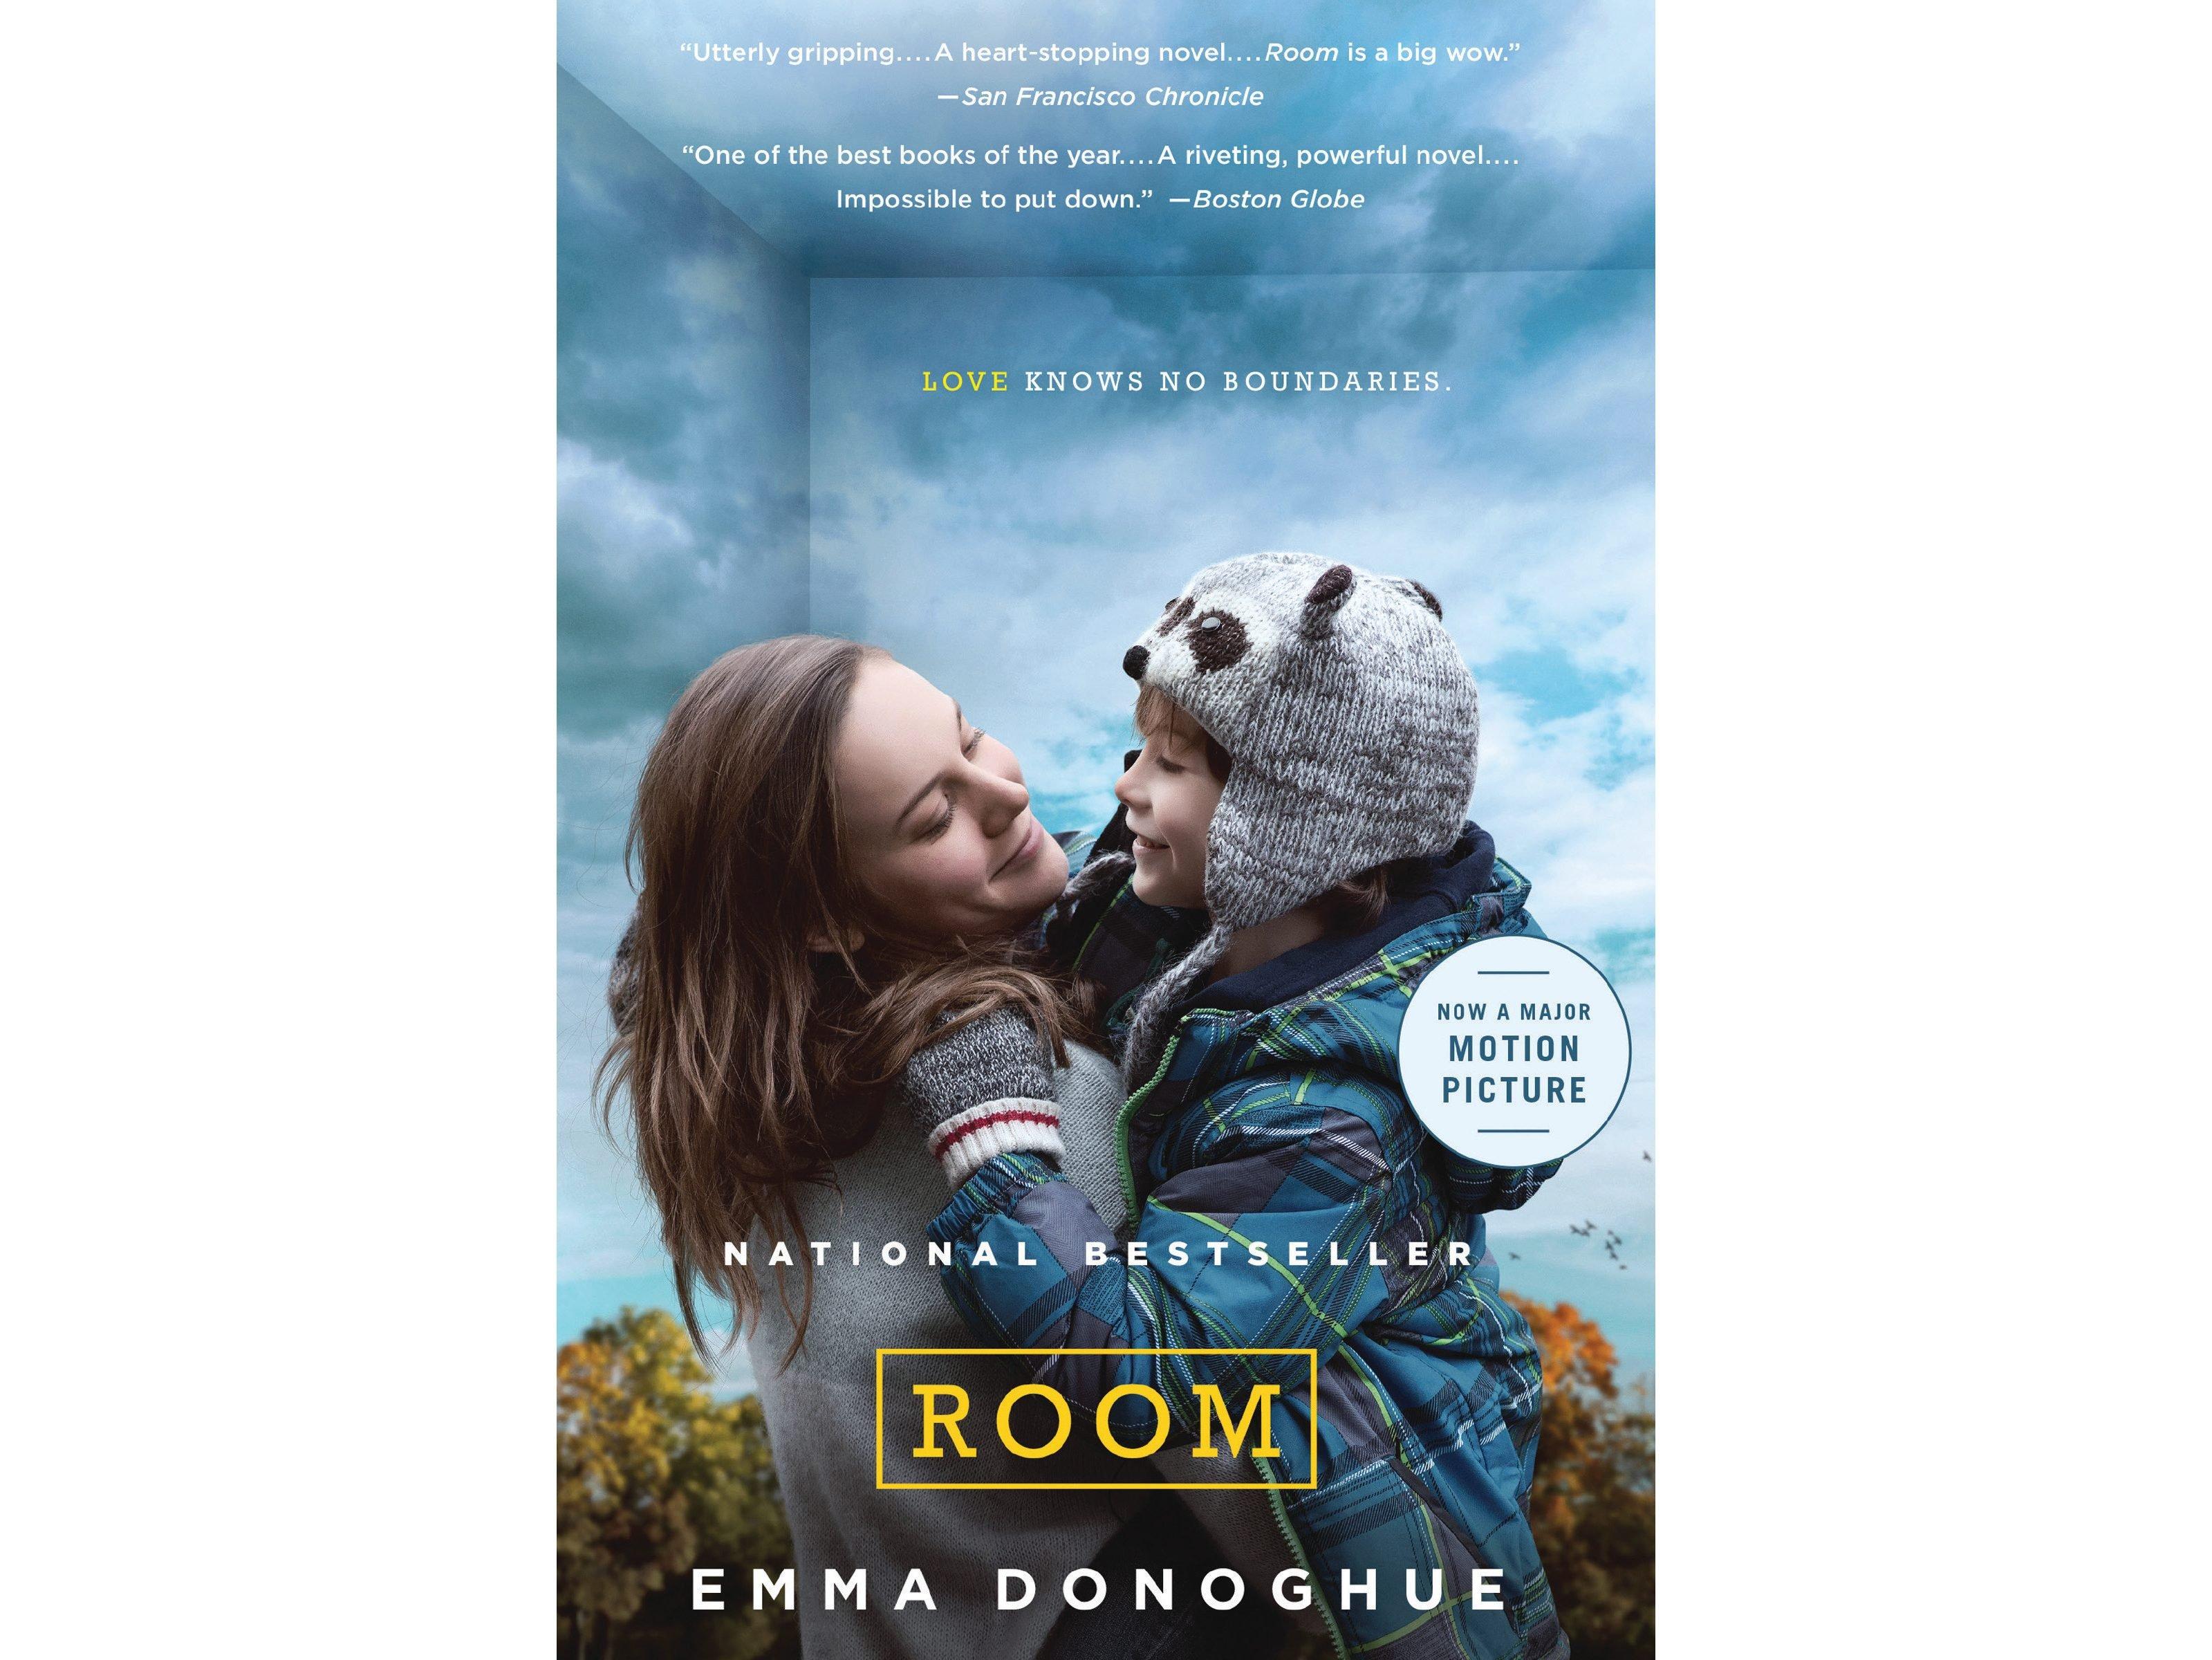 7. Room by Emma Donoghue